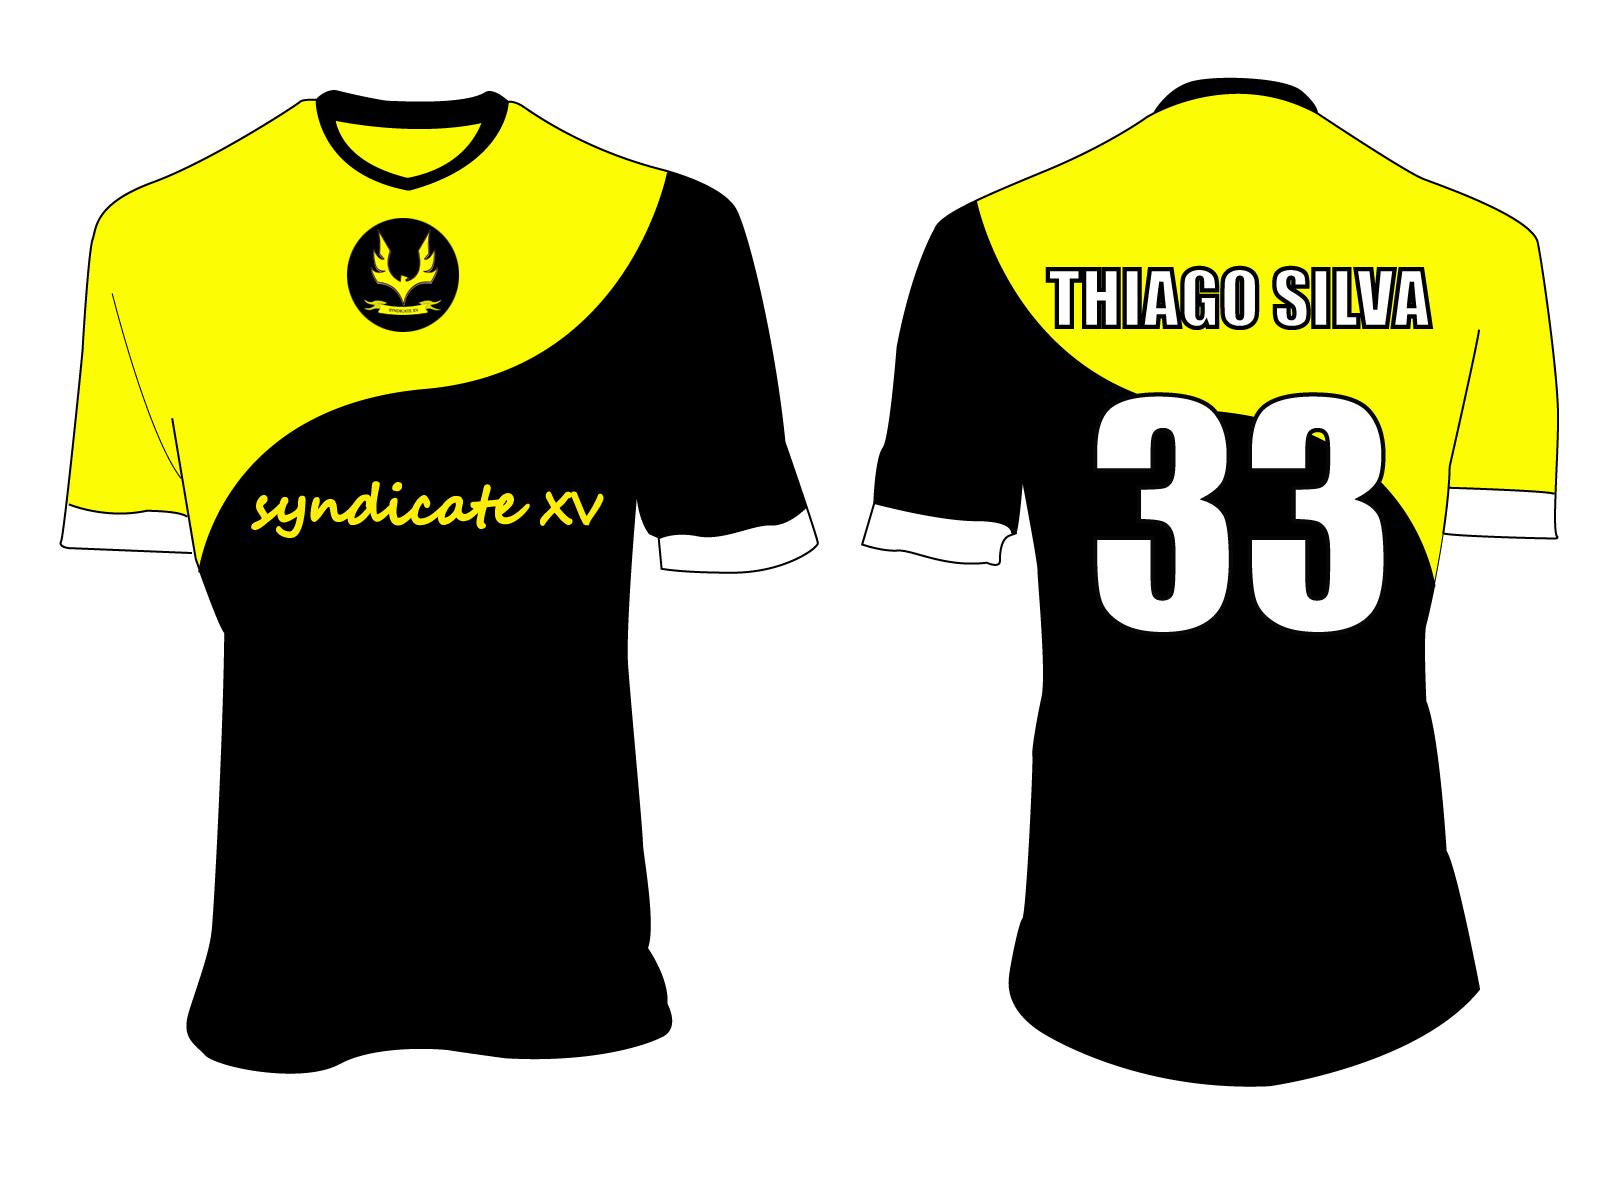 Jual Baju Futsal Lengan Panjang | newhairstylesformen2014.com